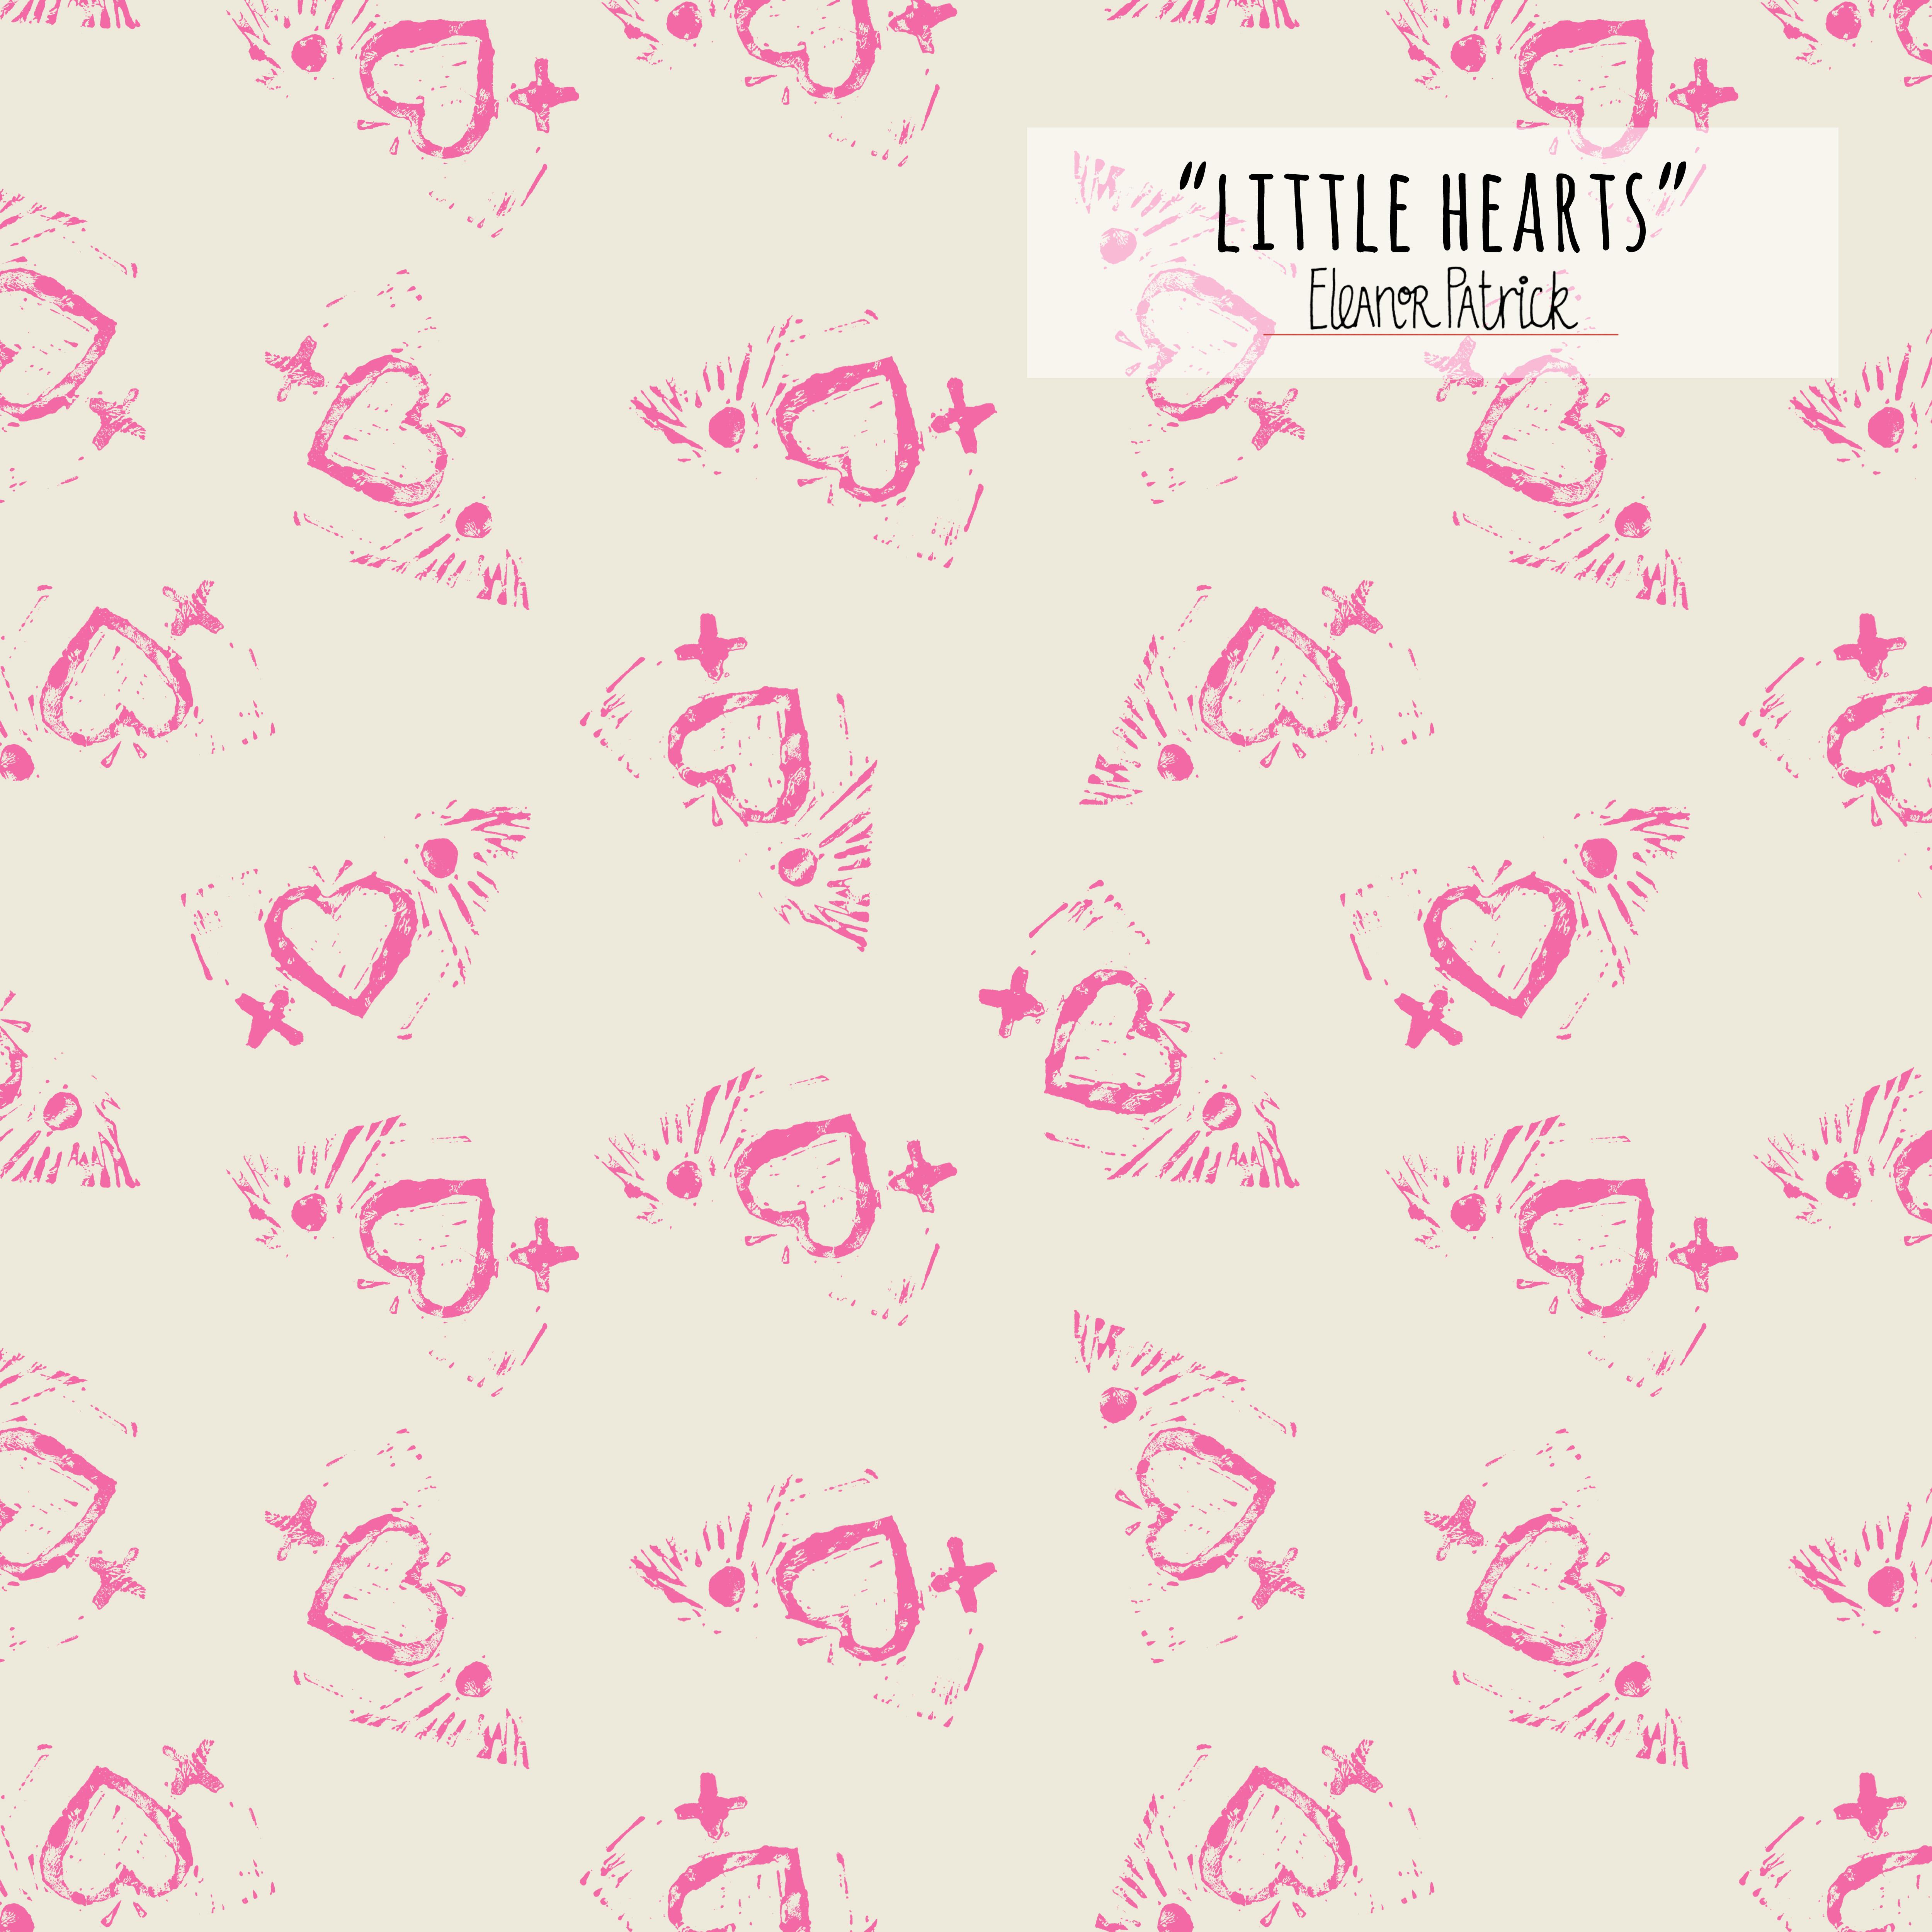 little hearts sample